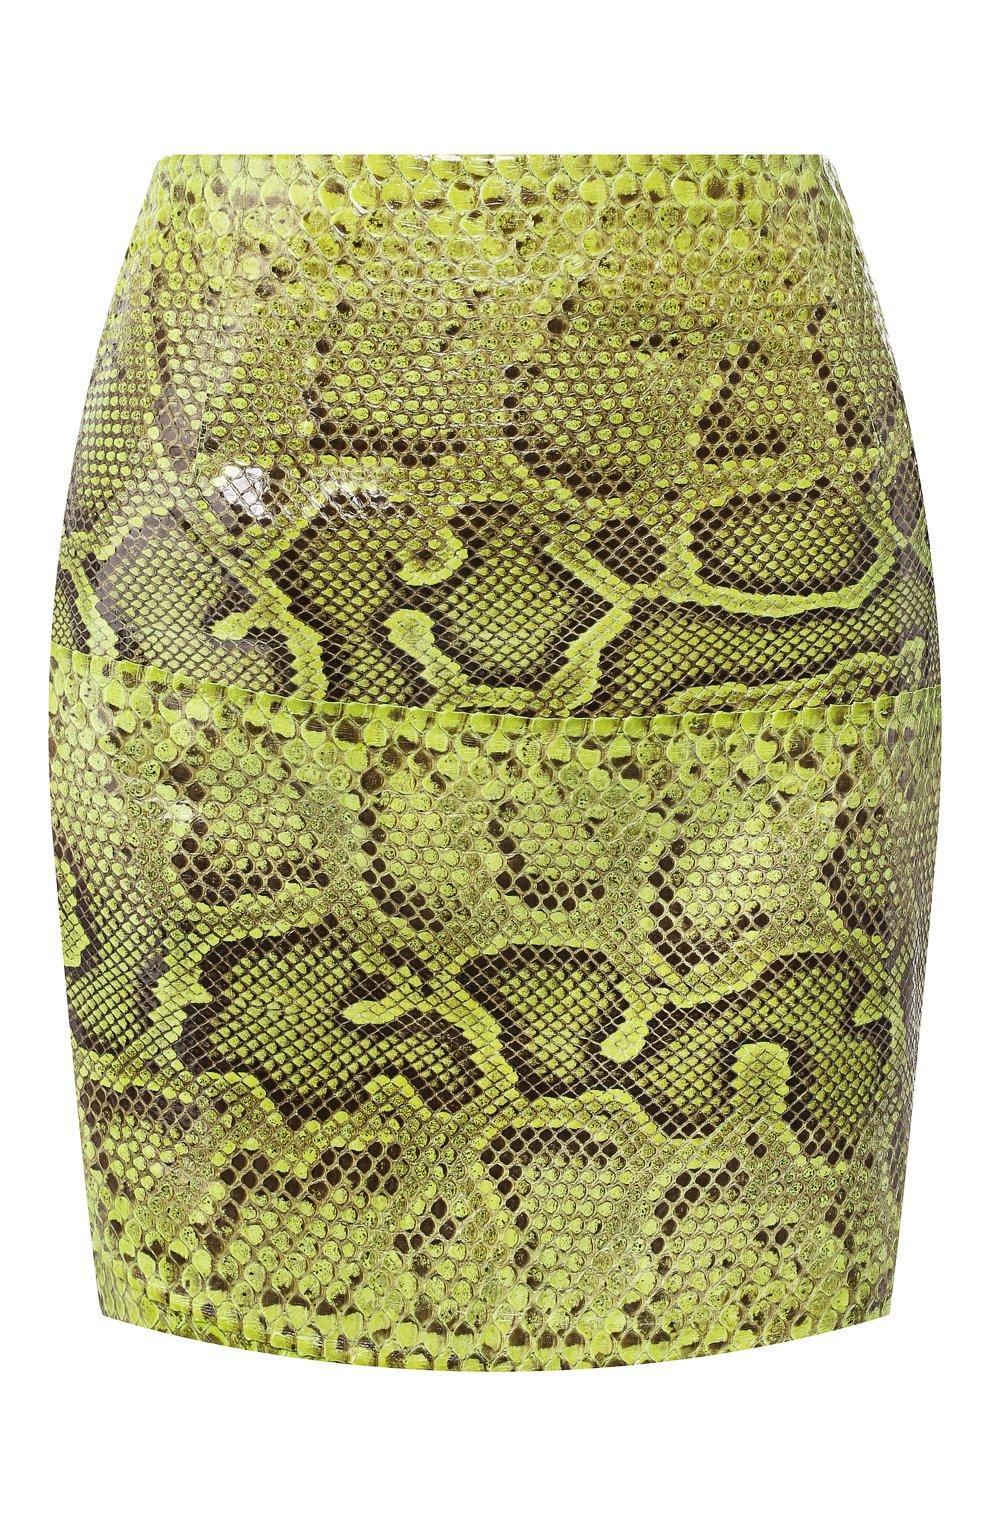 Женская юбка из кожи питона DOLCE & GABBANA зеленого цвета, арт. F4BWCL/HULI2/PBIV | Фото 1